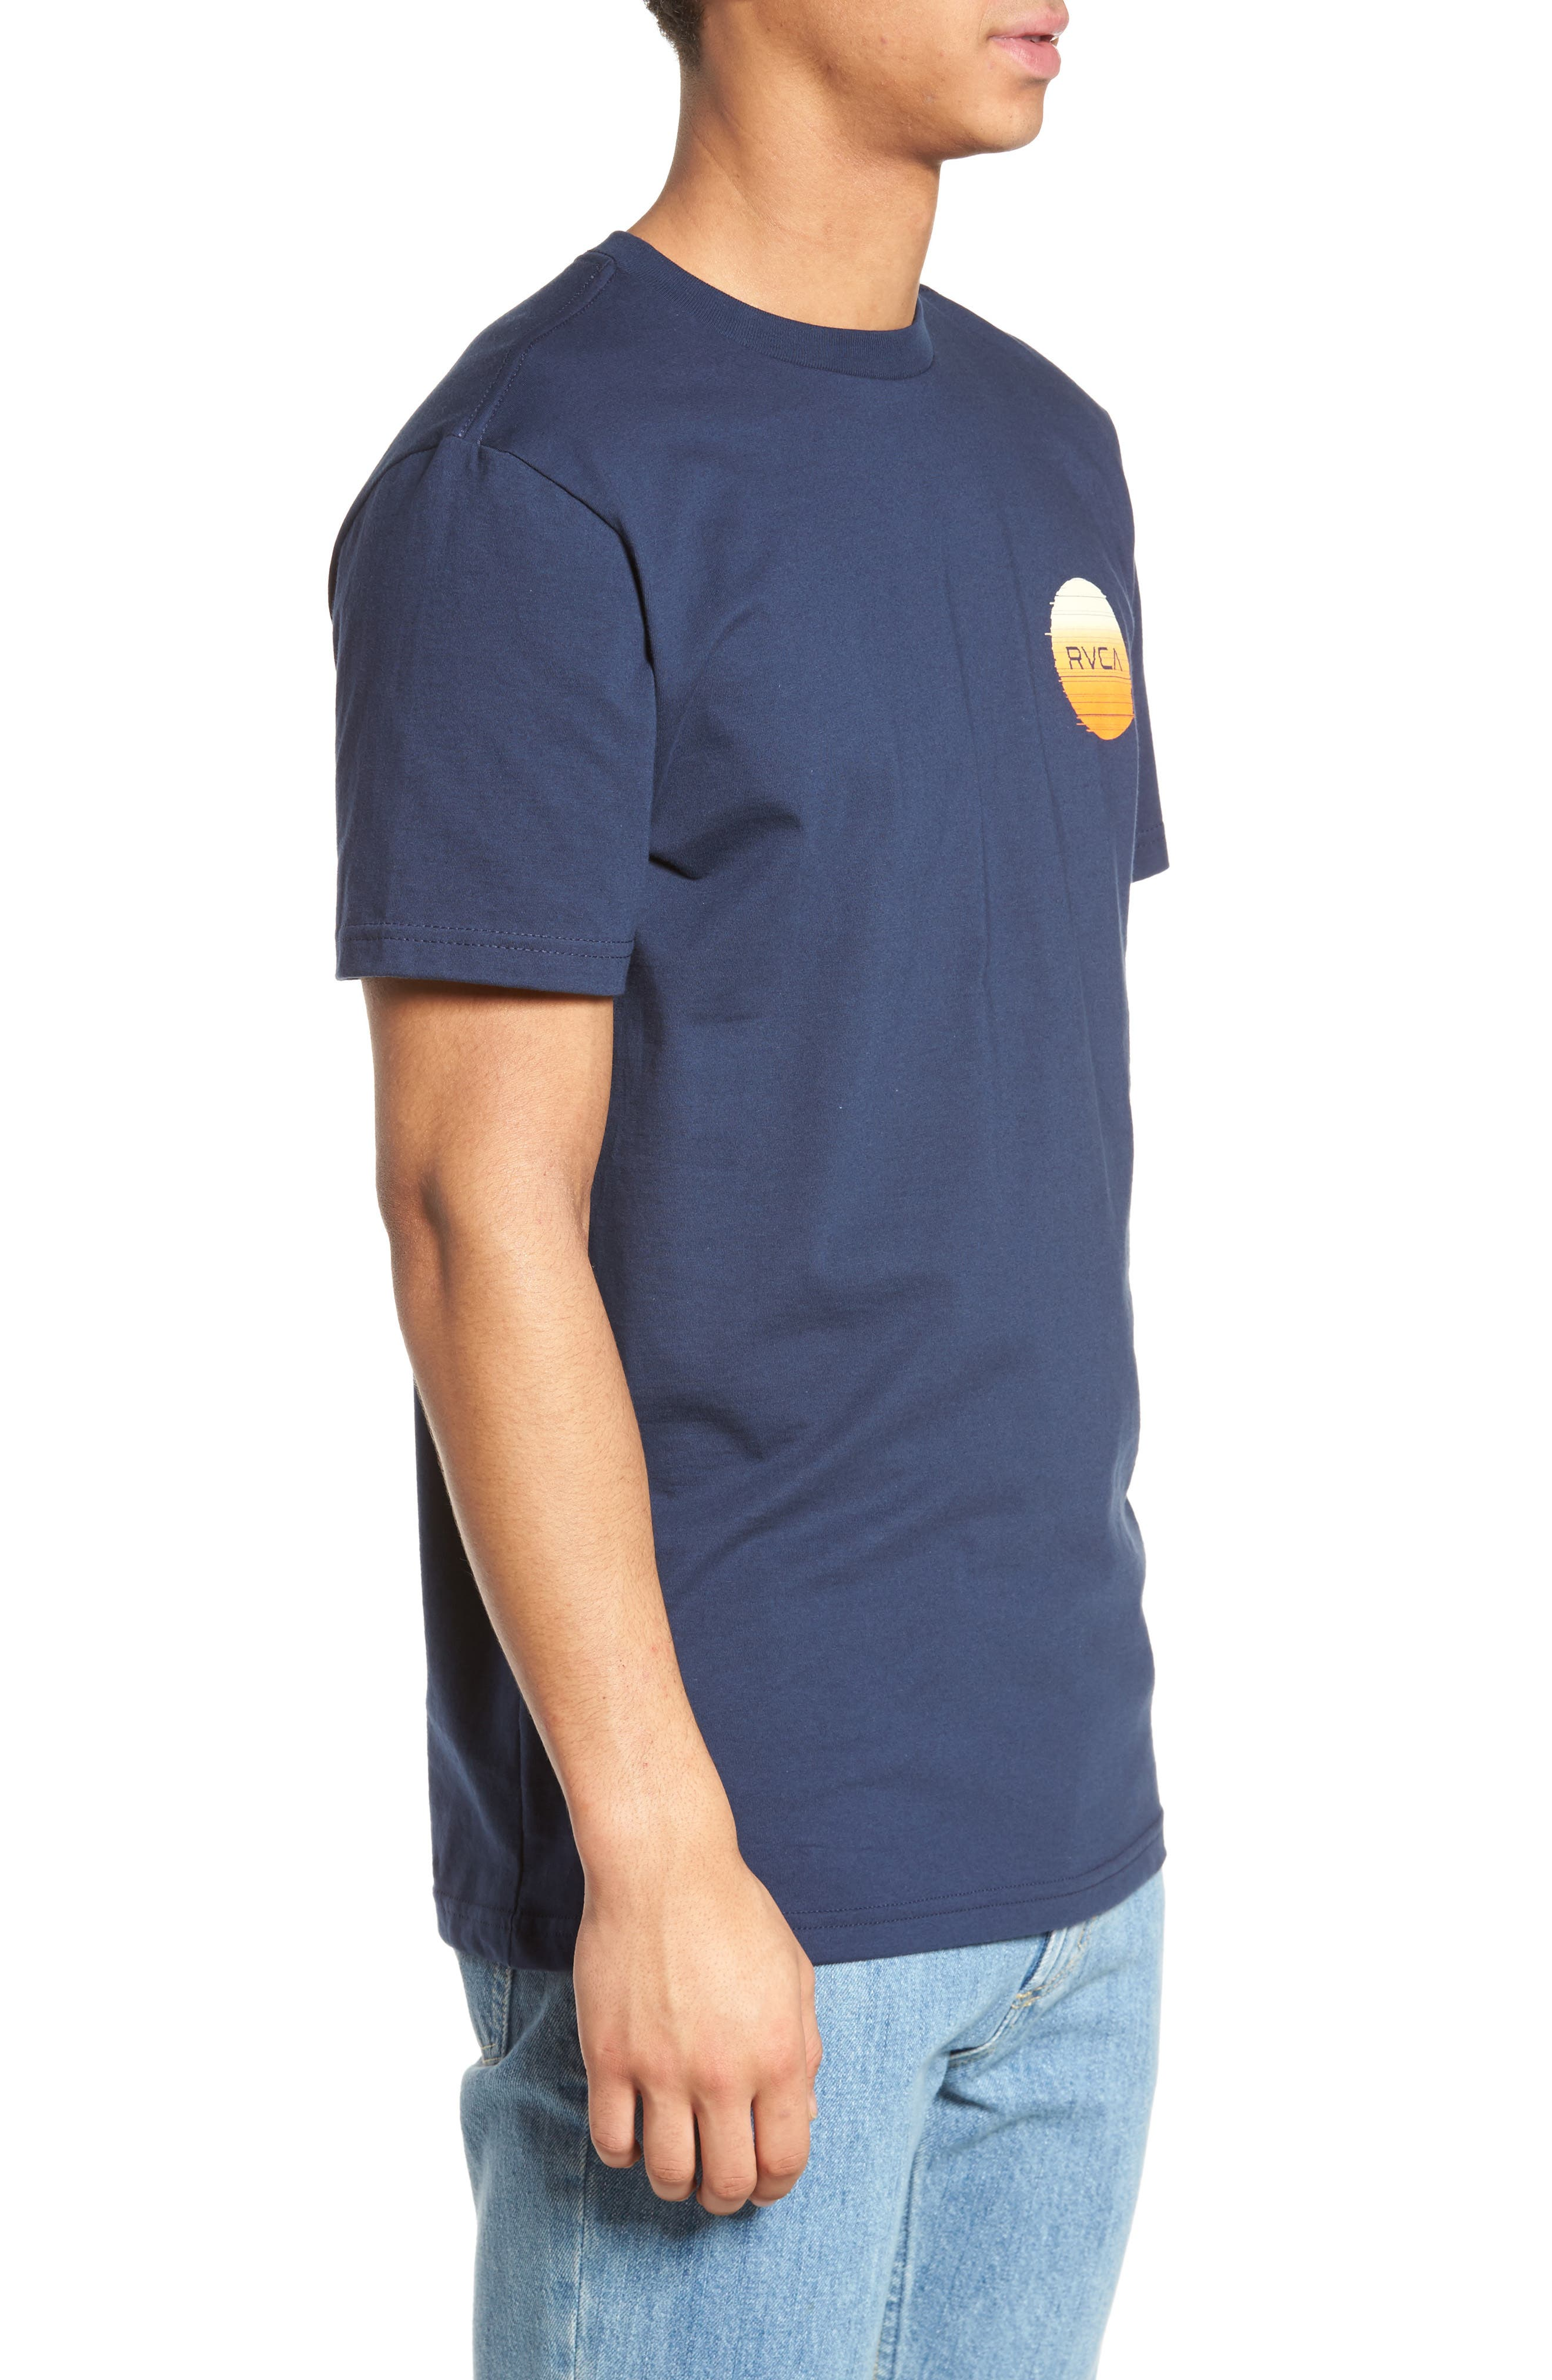 Glitch Motors T-Shirt,                             Alternate thumbnail 3, color,                             Federal Blue